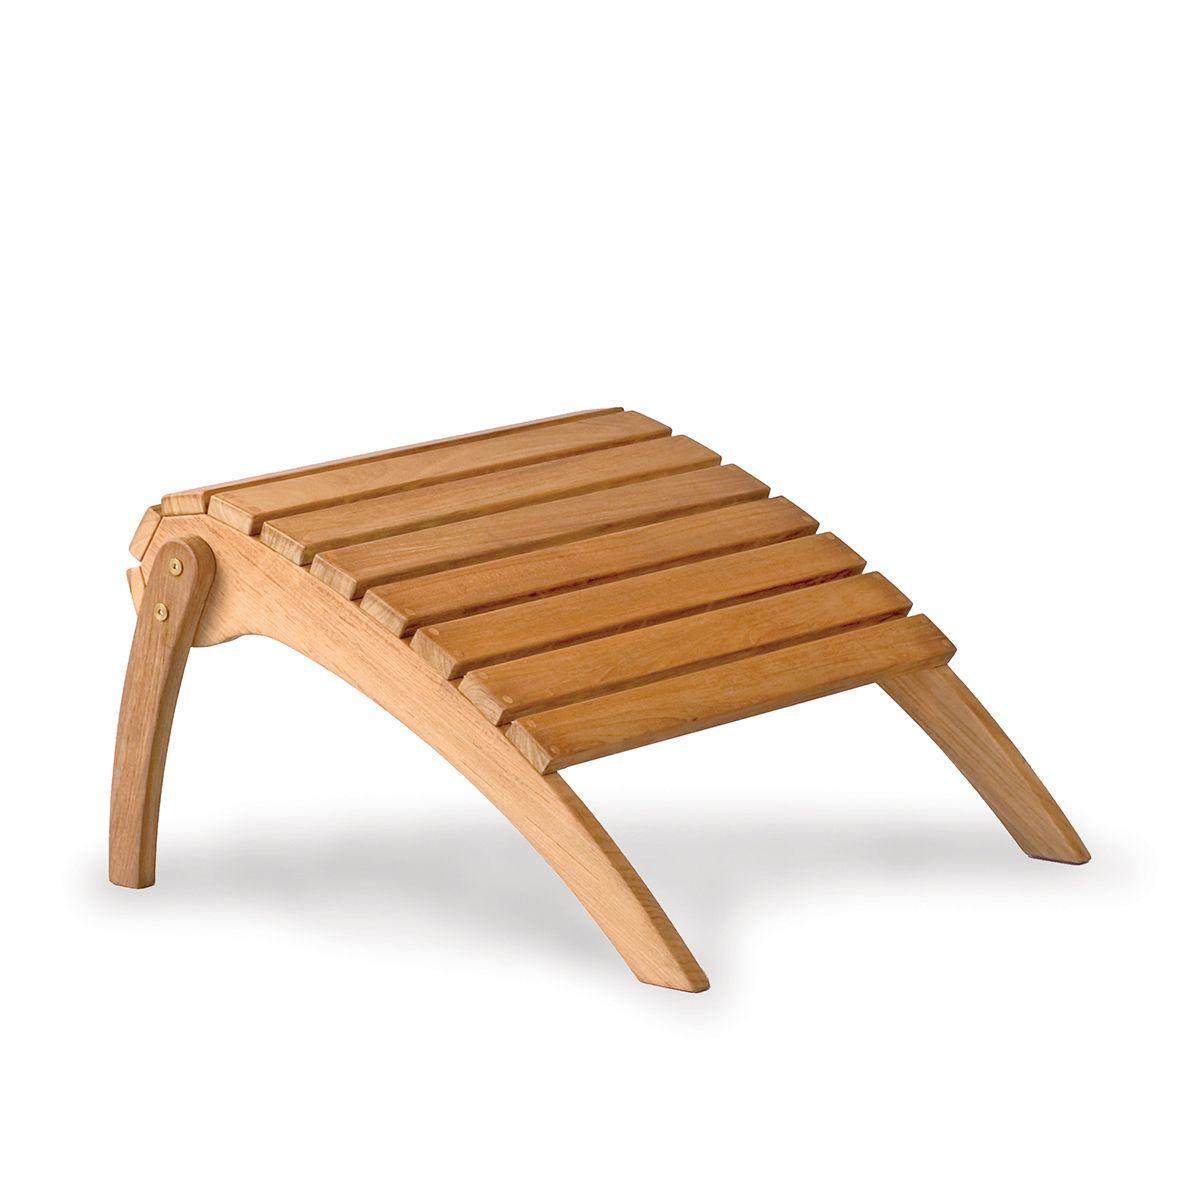 Teak Adirondack Footstool Bainbridge Collection By Thos Baker Teak Outdoor Cheap Outdoor Chairs Teak Adirondack Chairs